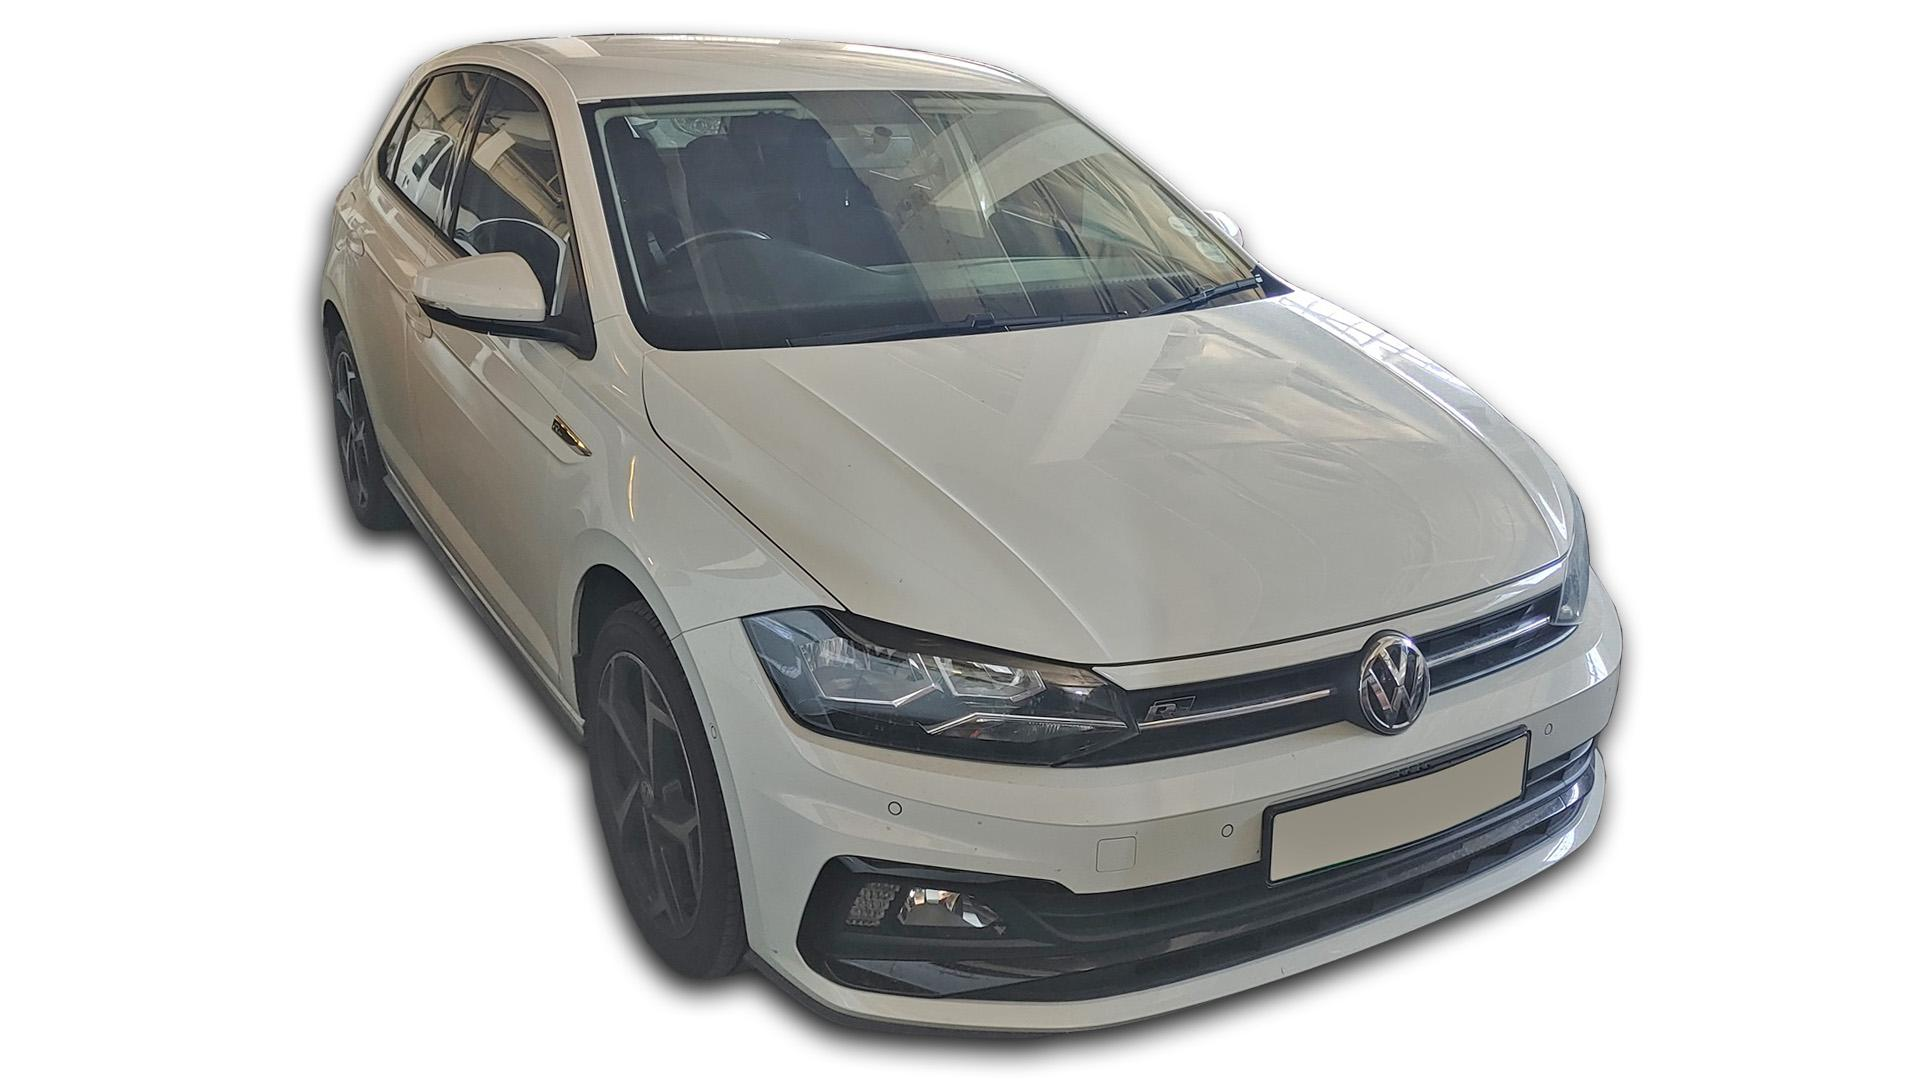 VW Polo 1.0 Tsi Comfor